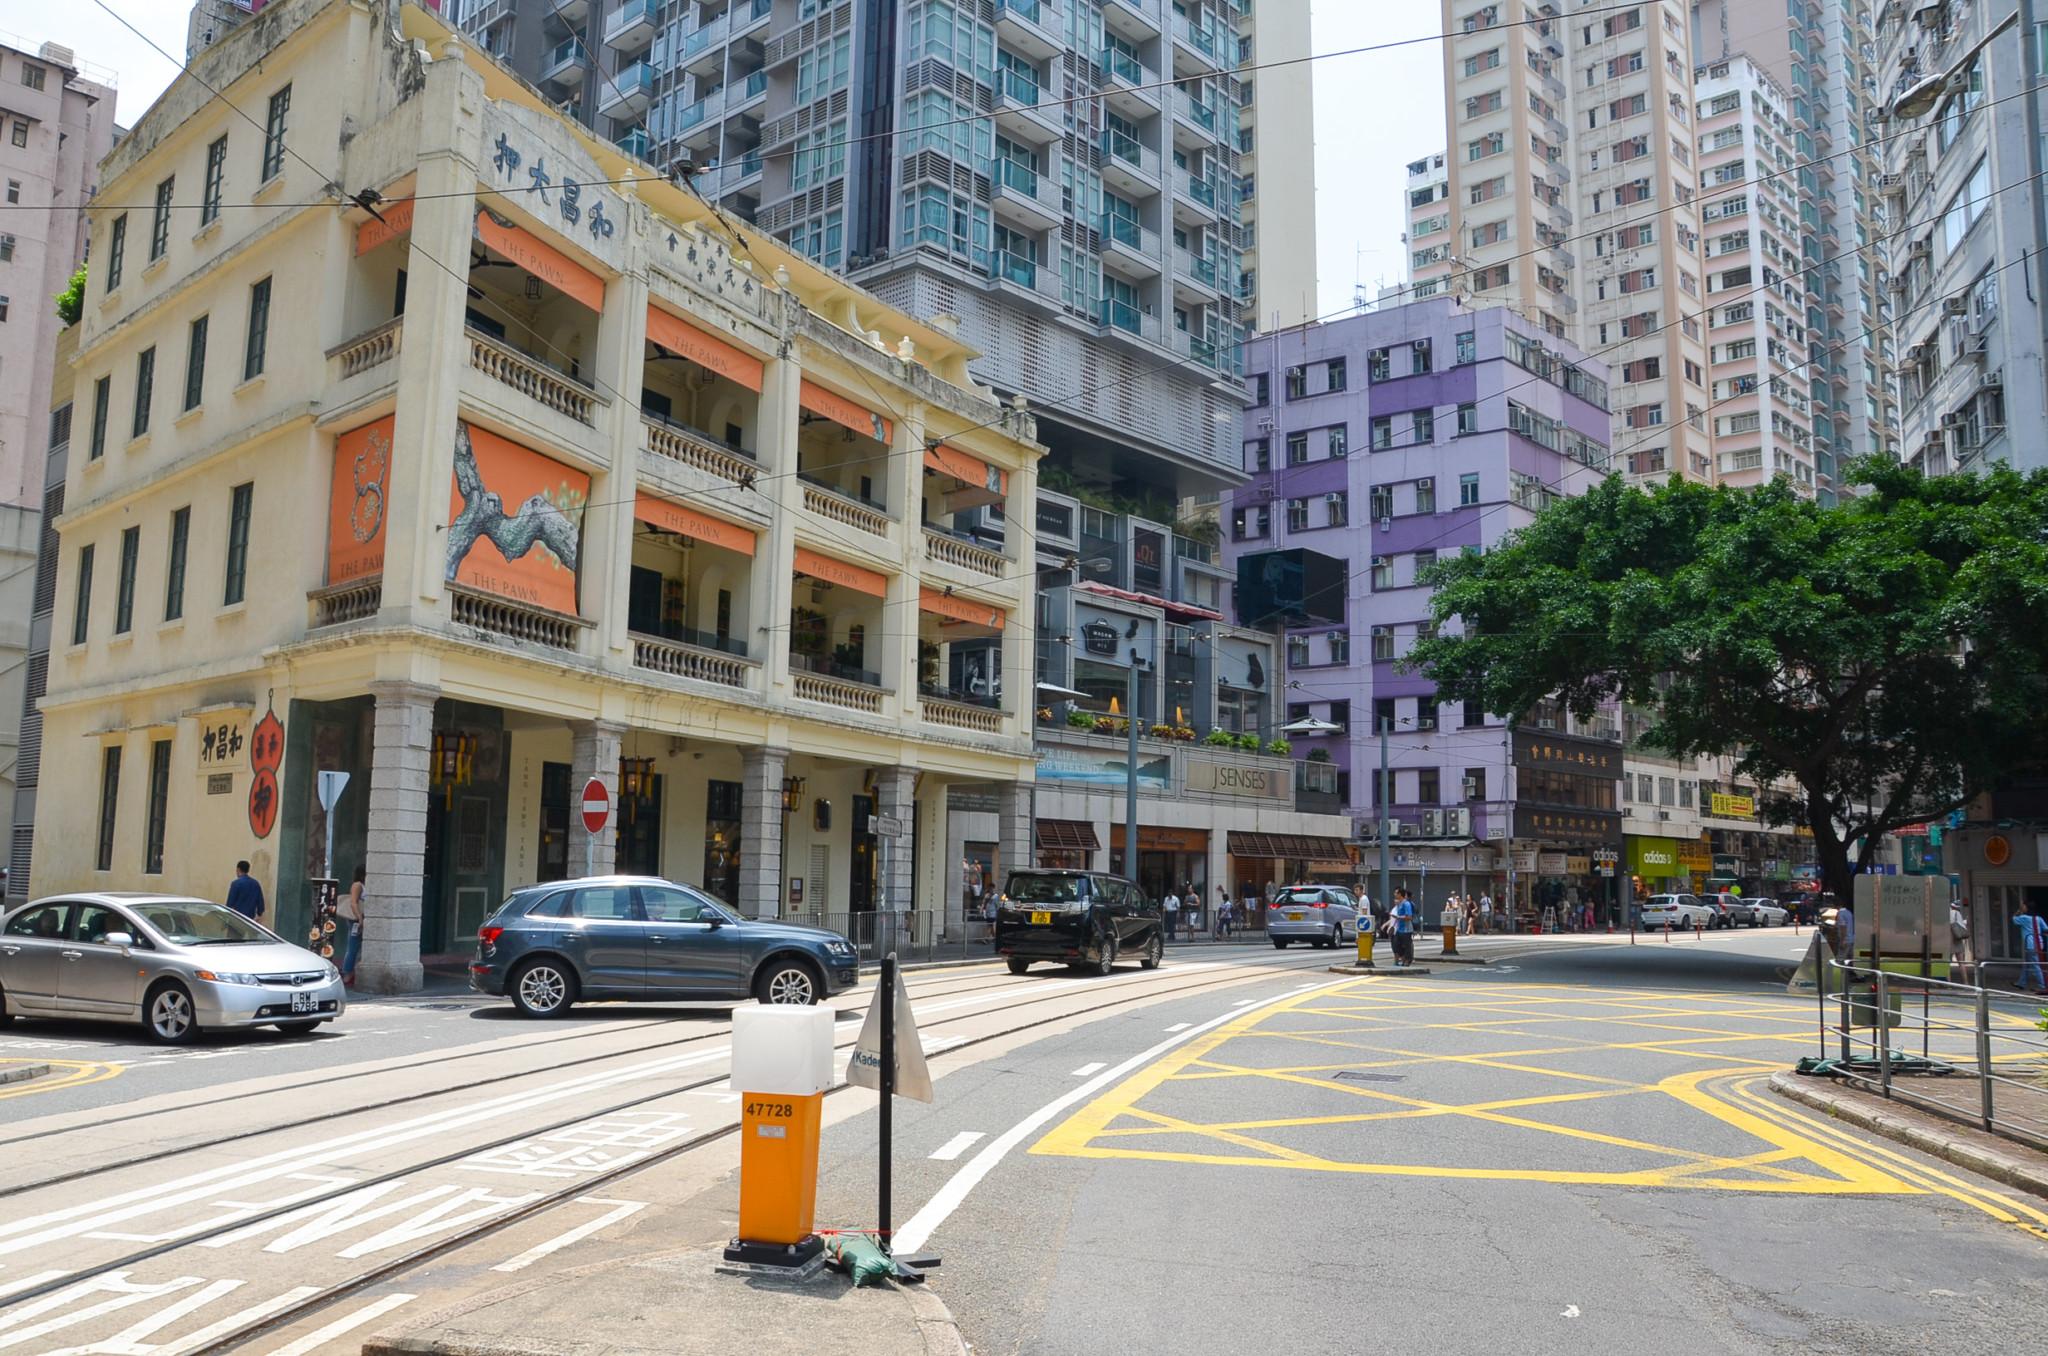 Central Hong Kong hat viele Bars und Restaurants